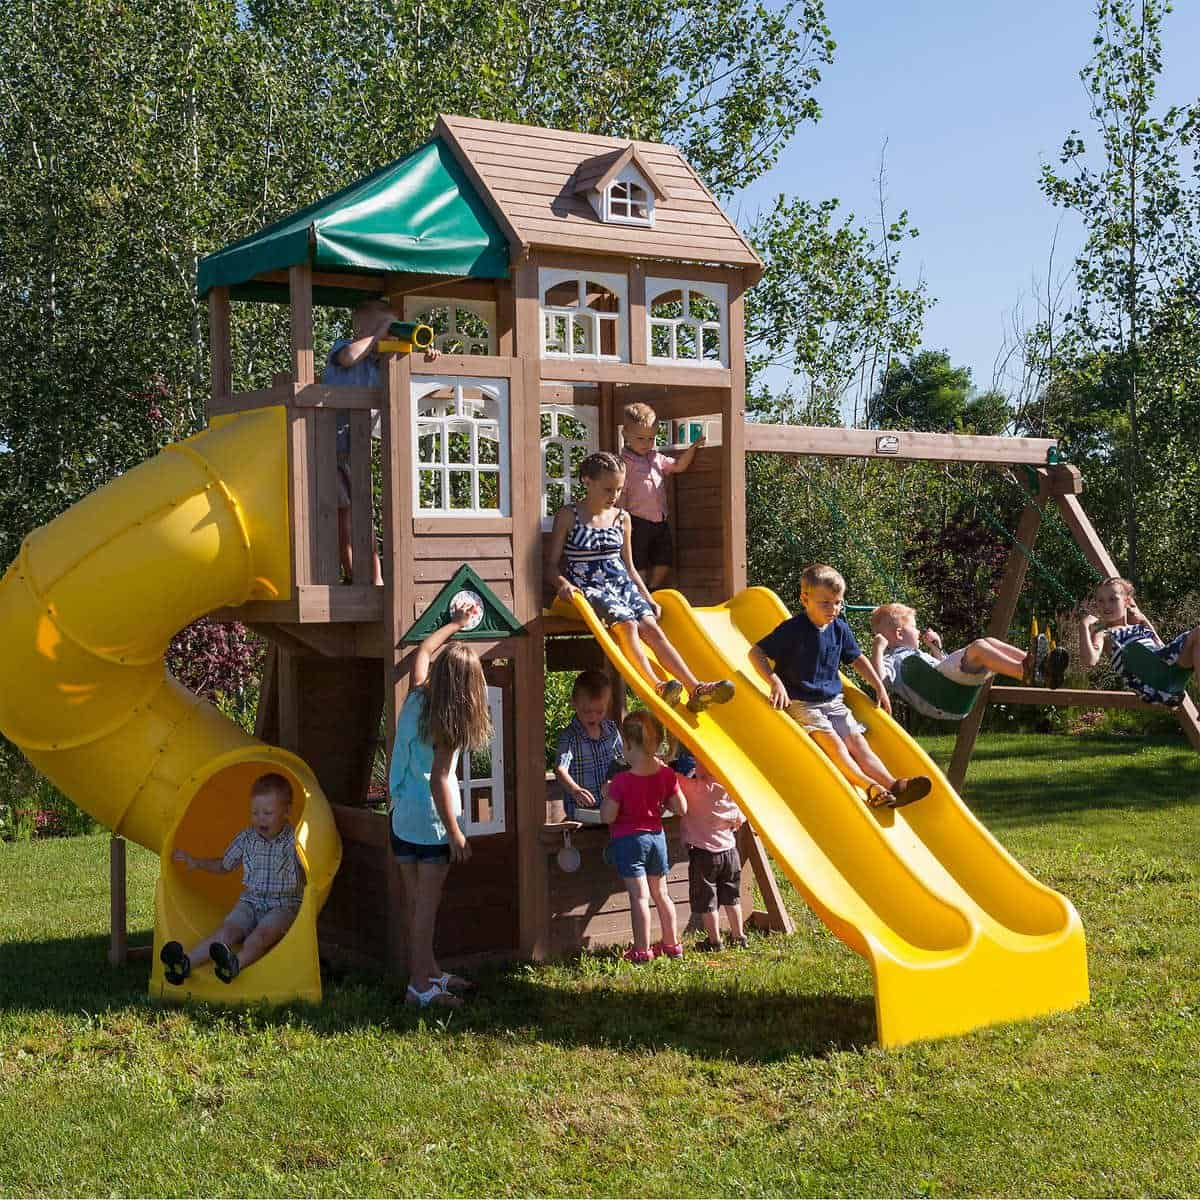 Best Outdoor Playset For Kids To Buy 2019 Littleonemag